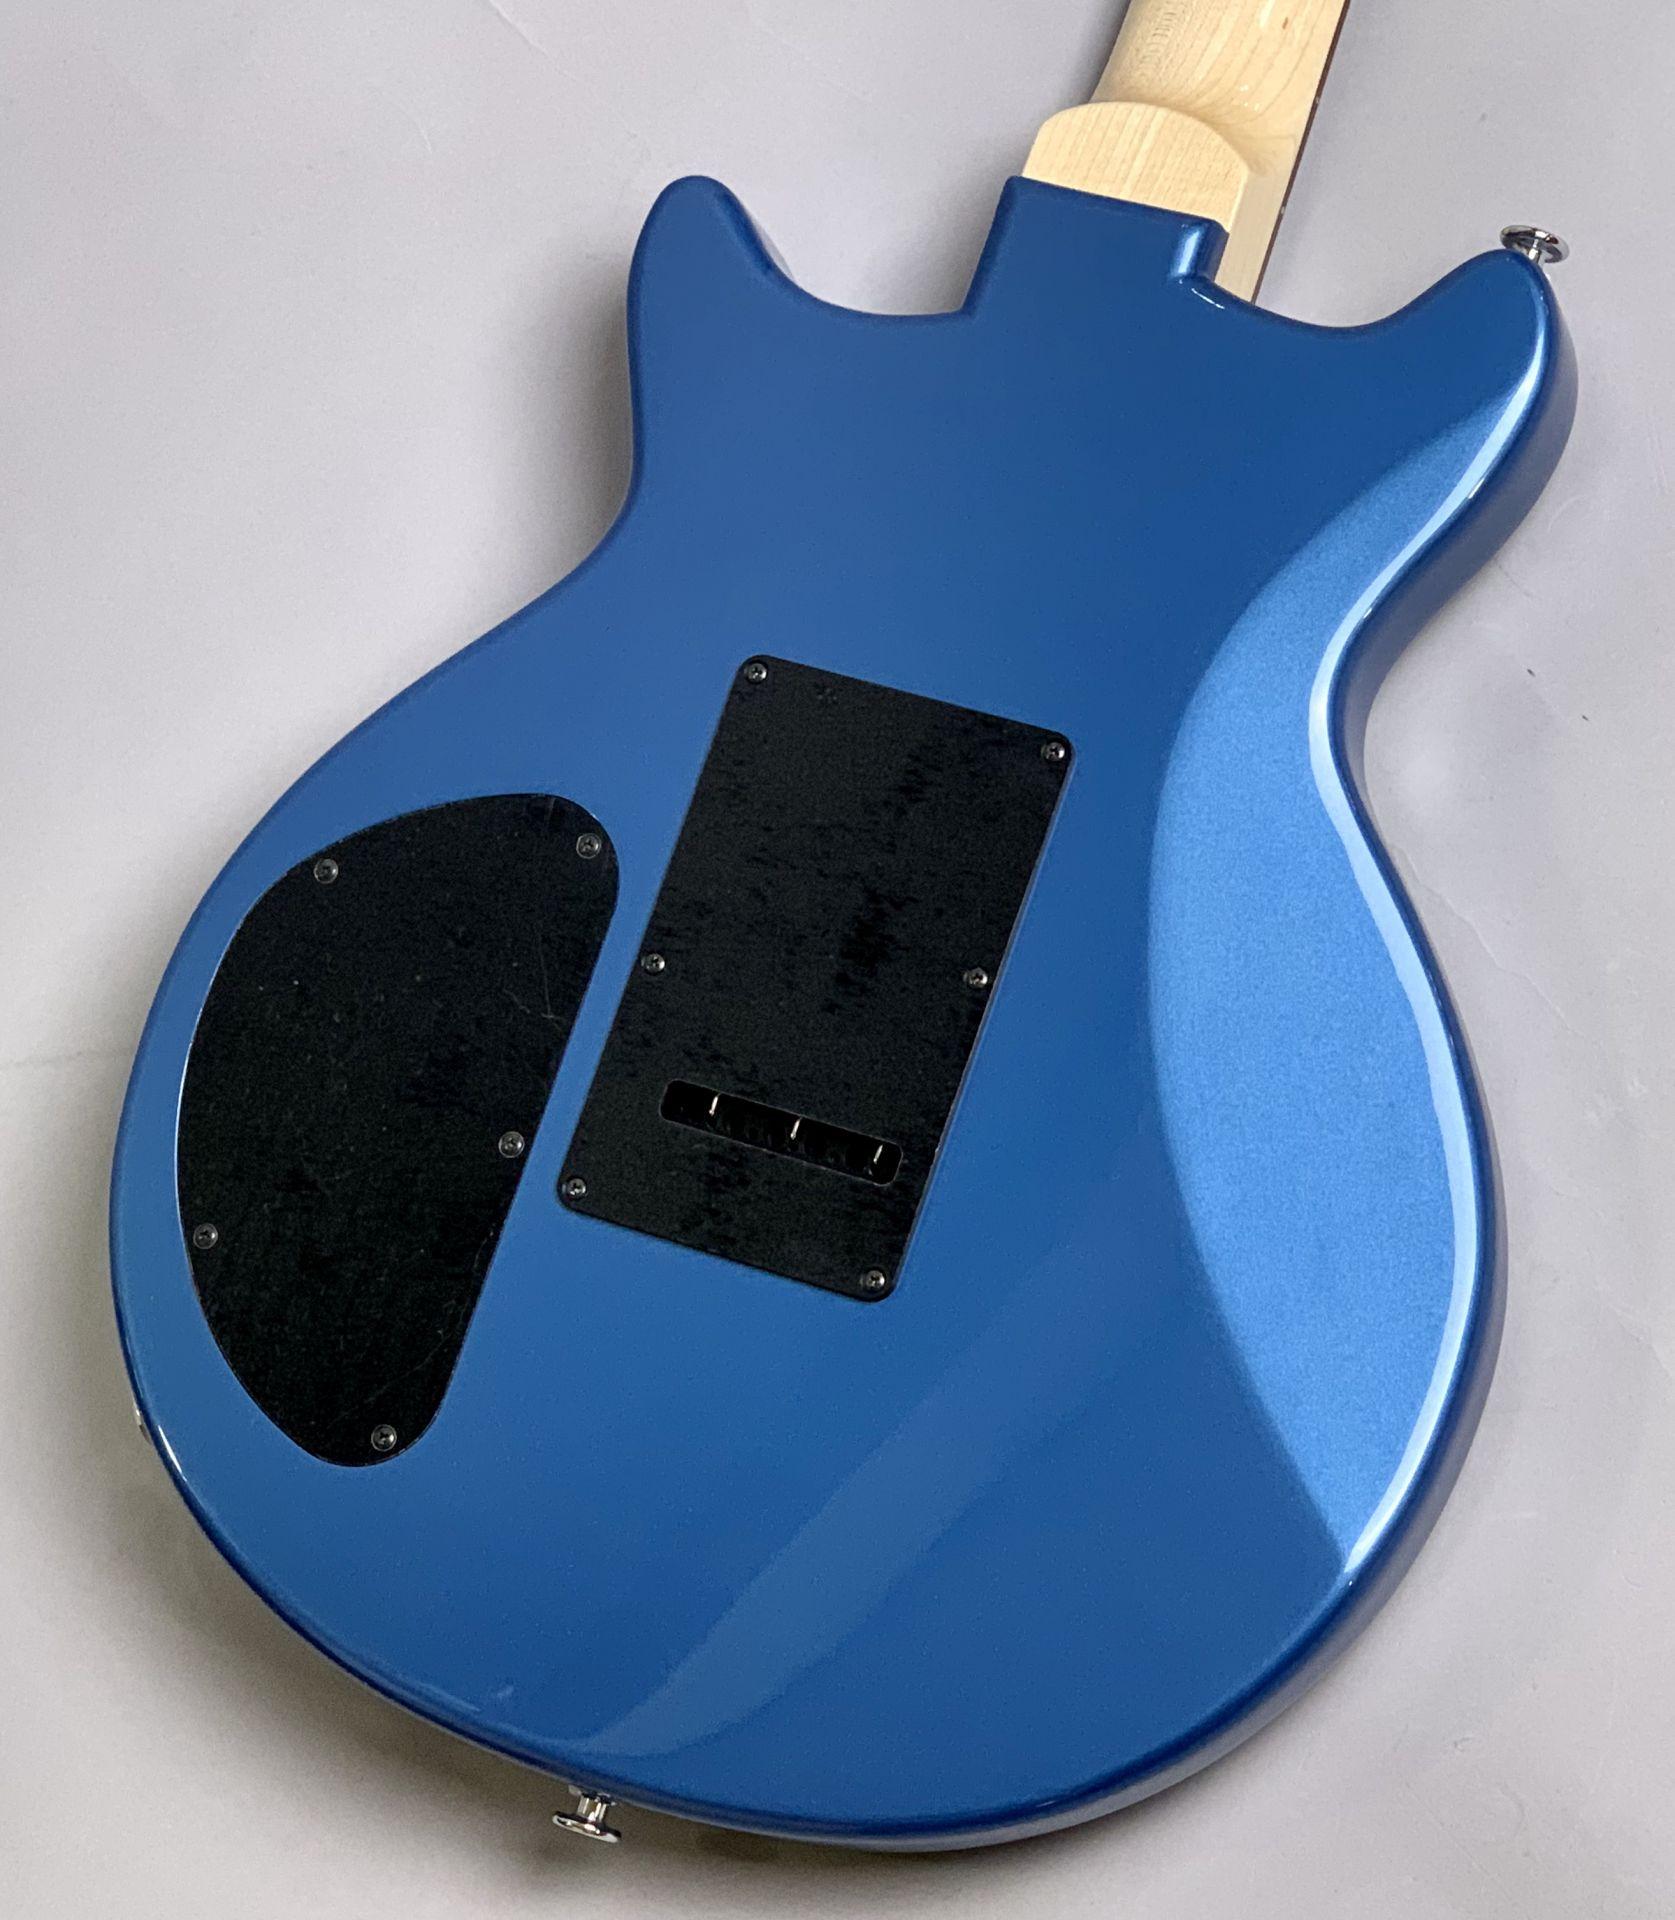 Kz One Junior SSD10 Synchro Lake Placid Blue【新開発ダブルコイル搭載特注モデル】のヘッド裏-アップ画像